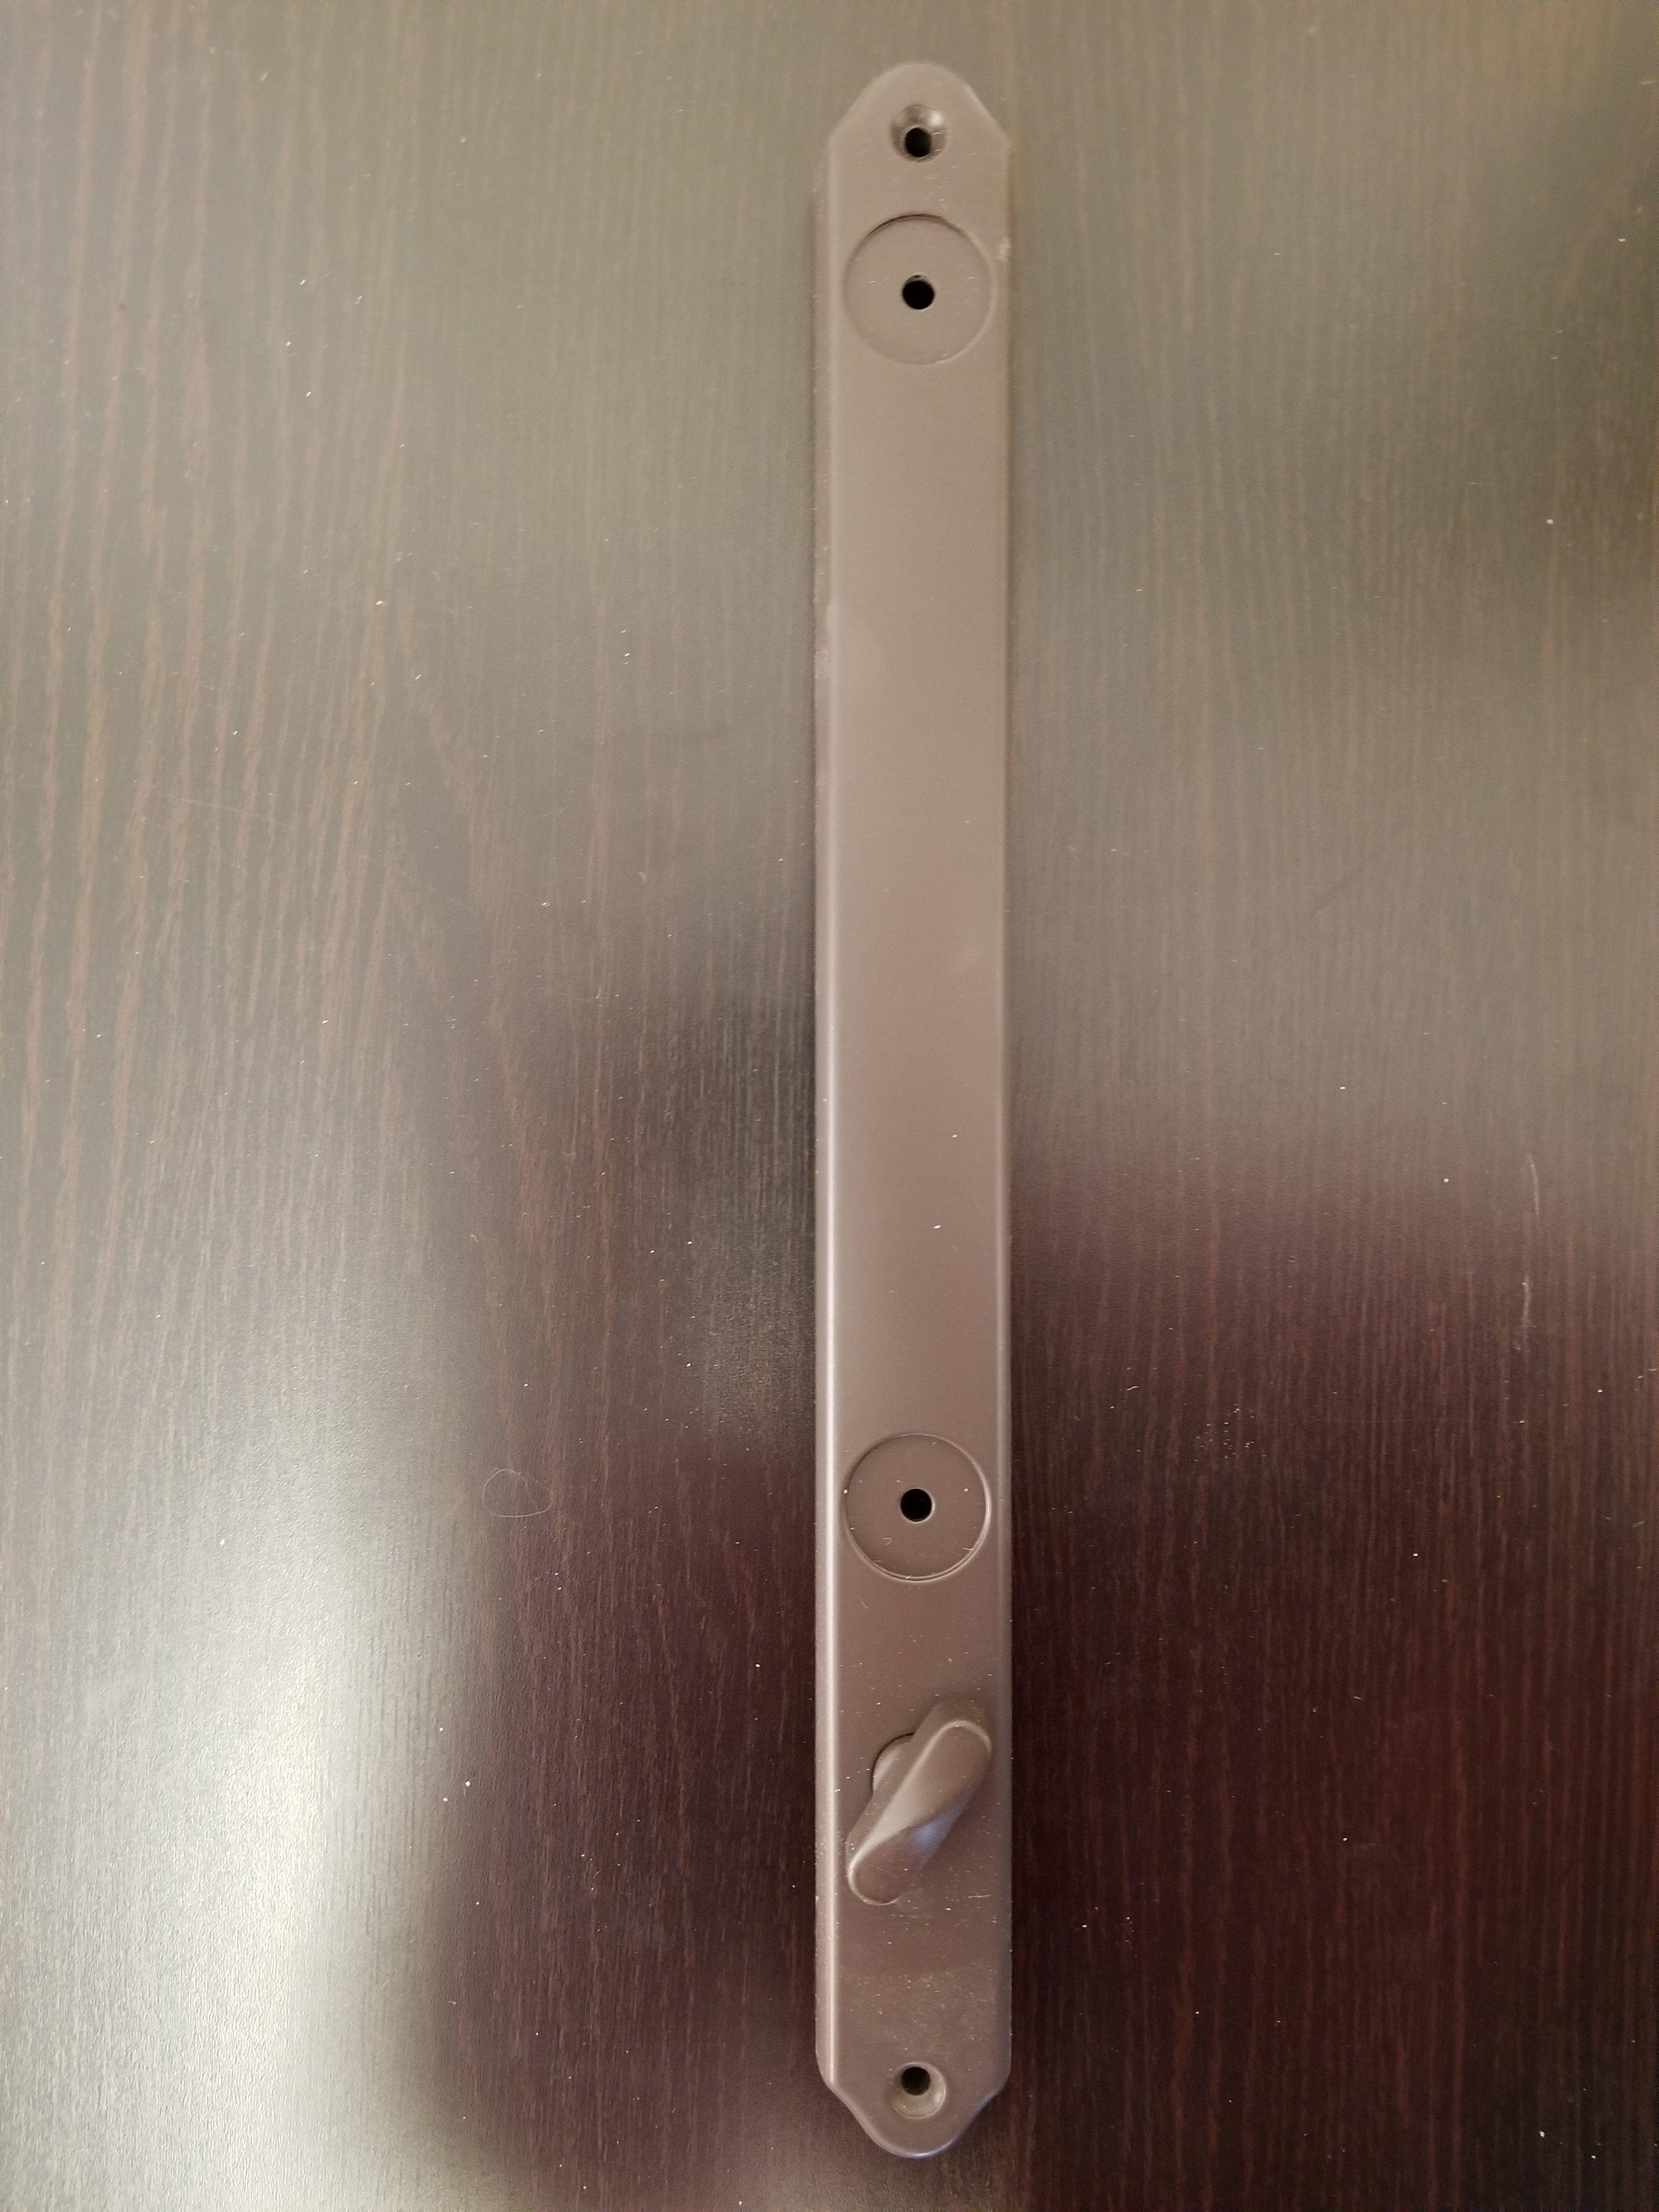 501 005 Sliding Patio Door Replacement Interior Faceplate